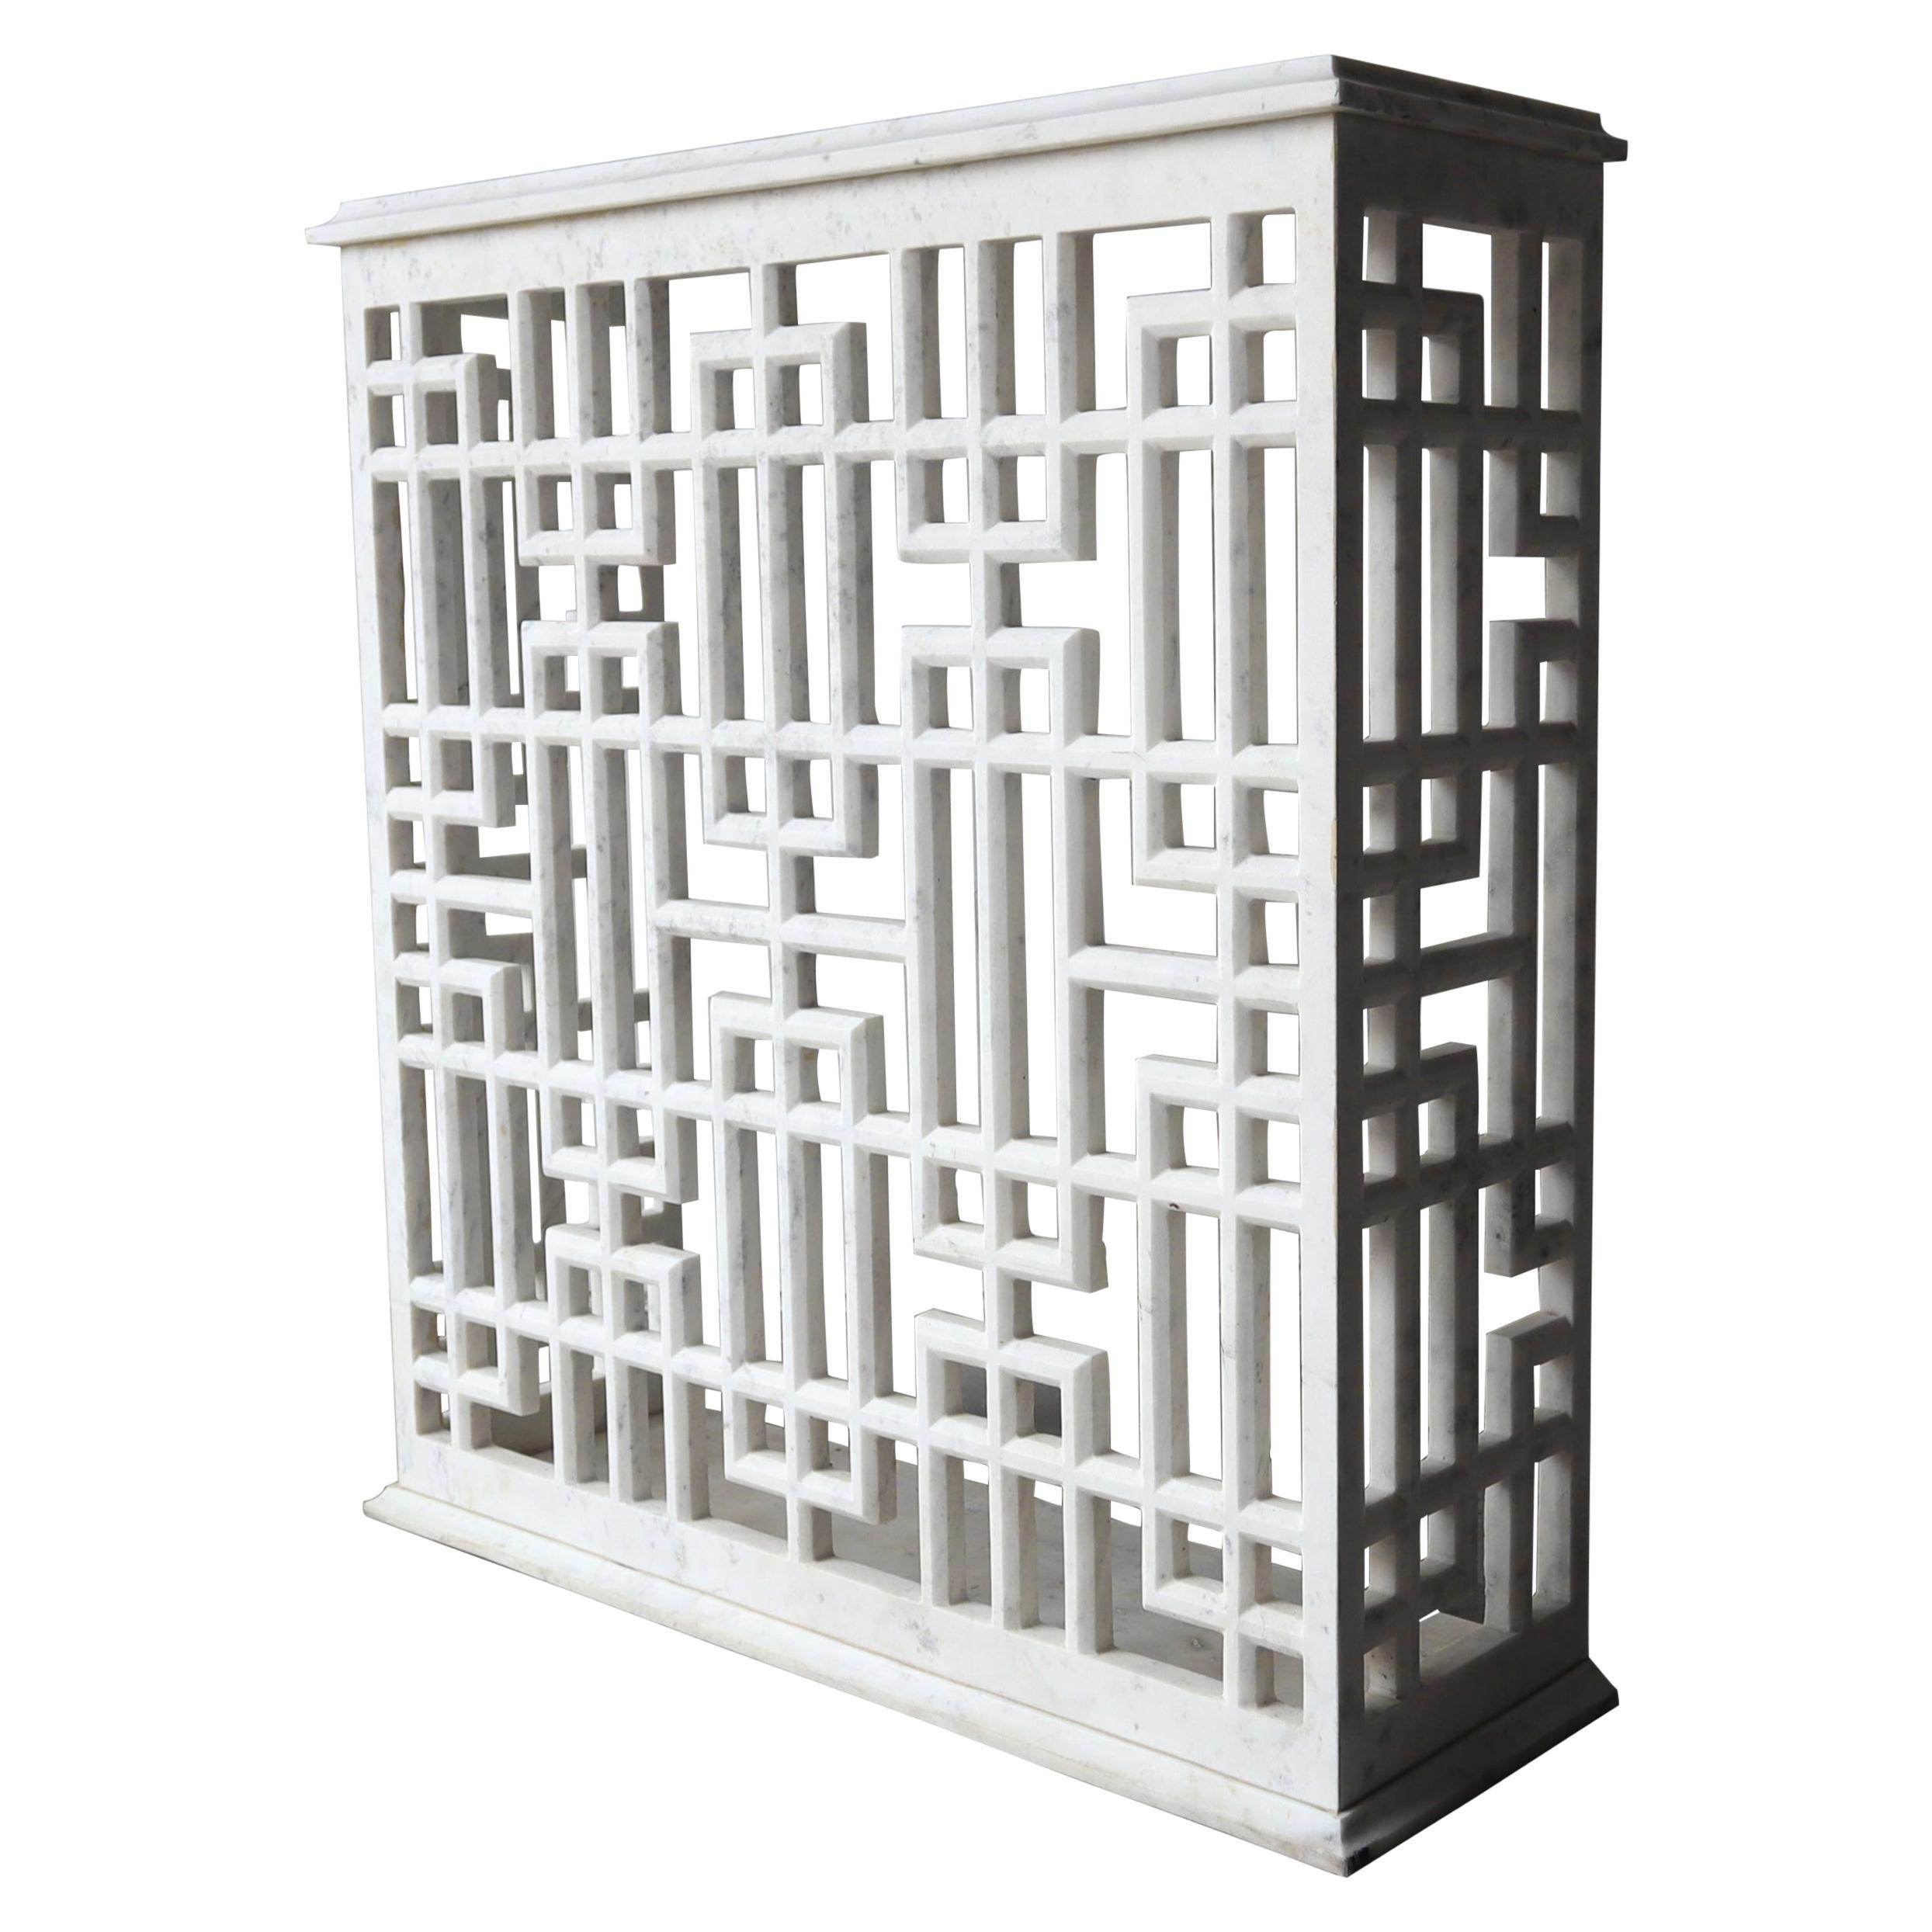 Carrara Marble Fretwork Entry Console Table